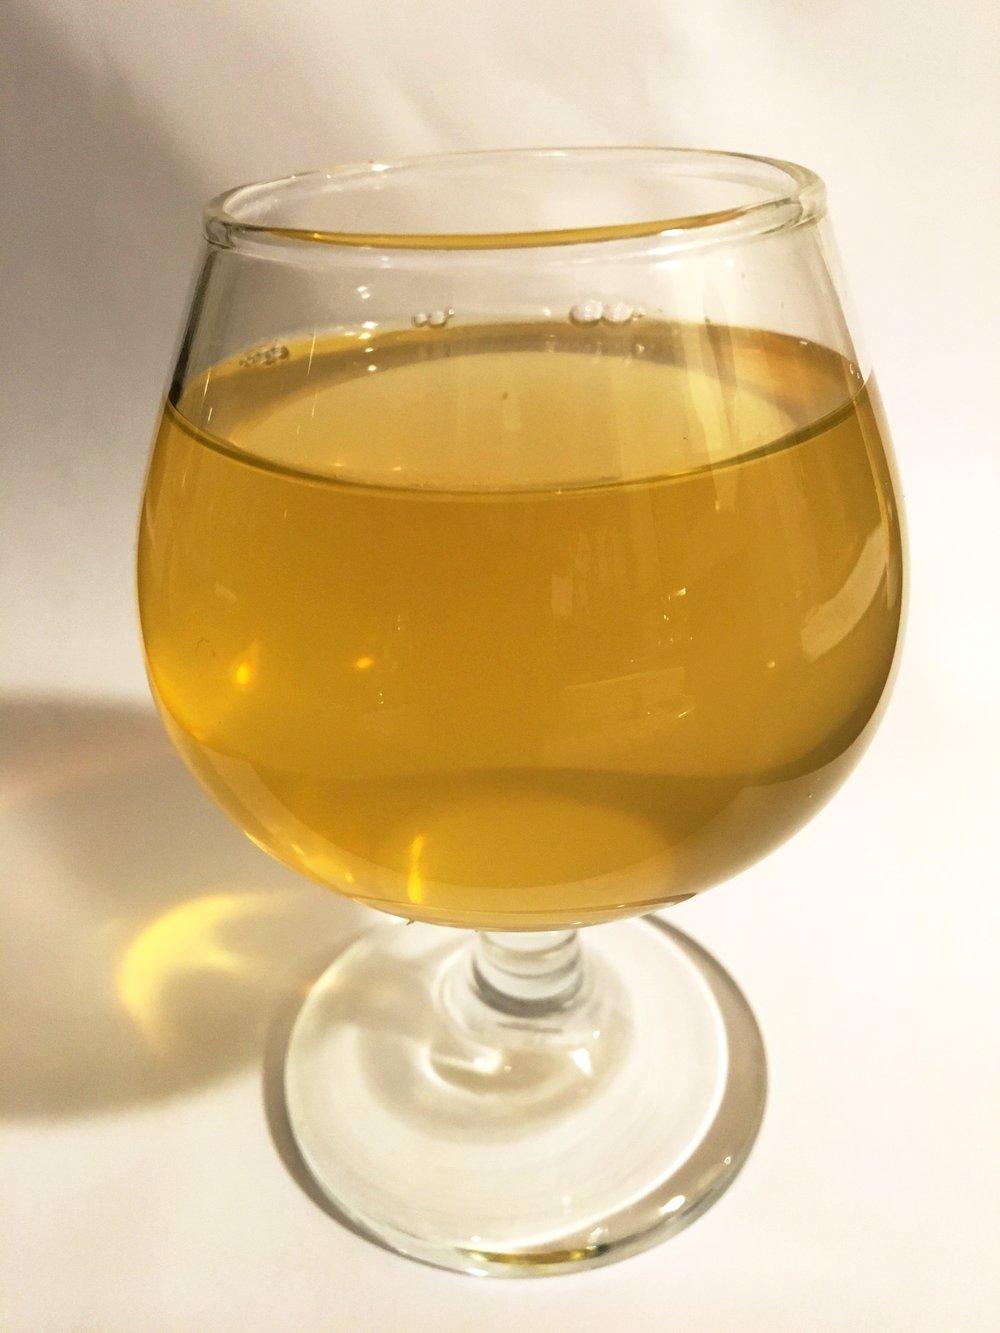 Russet Cow Cider